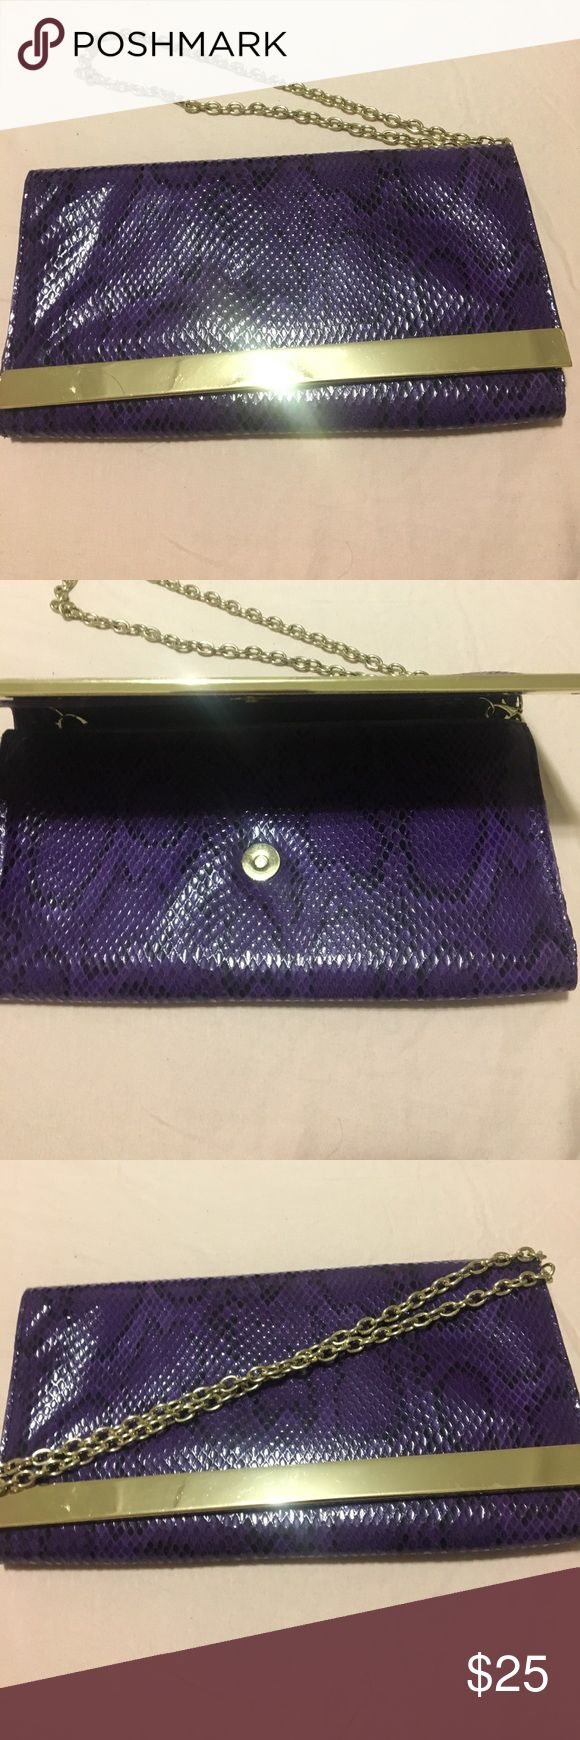 Purple animal print clutch Purple animal print clutch Bags Clutches & Wristlets